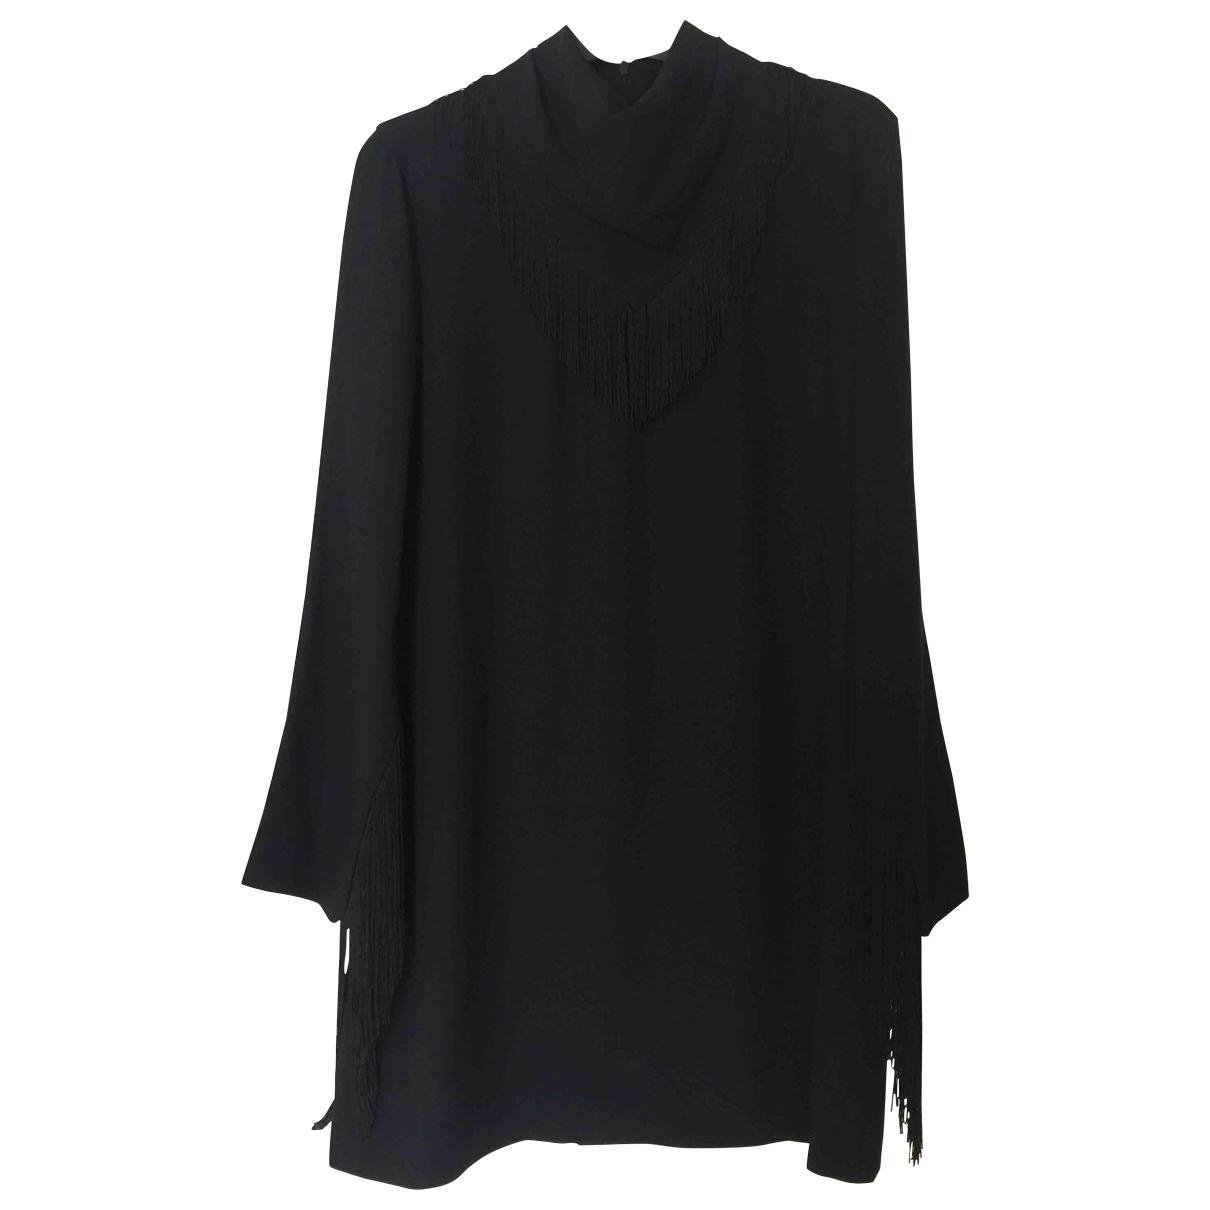 Vanessa Seward \N Navy dress for Women 42 FR